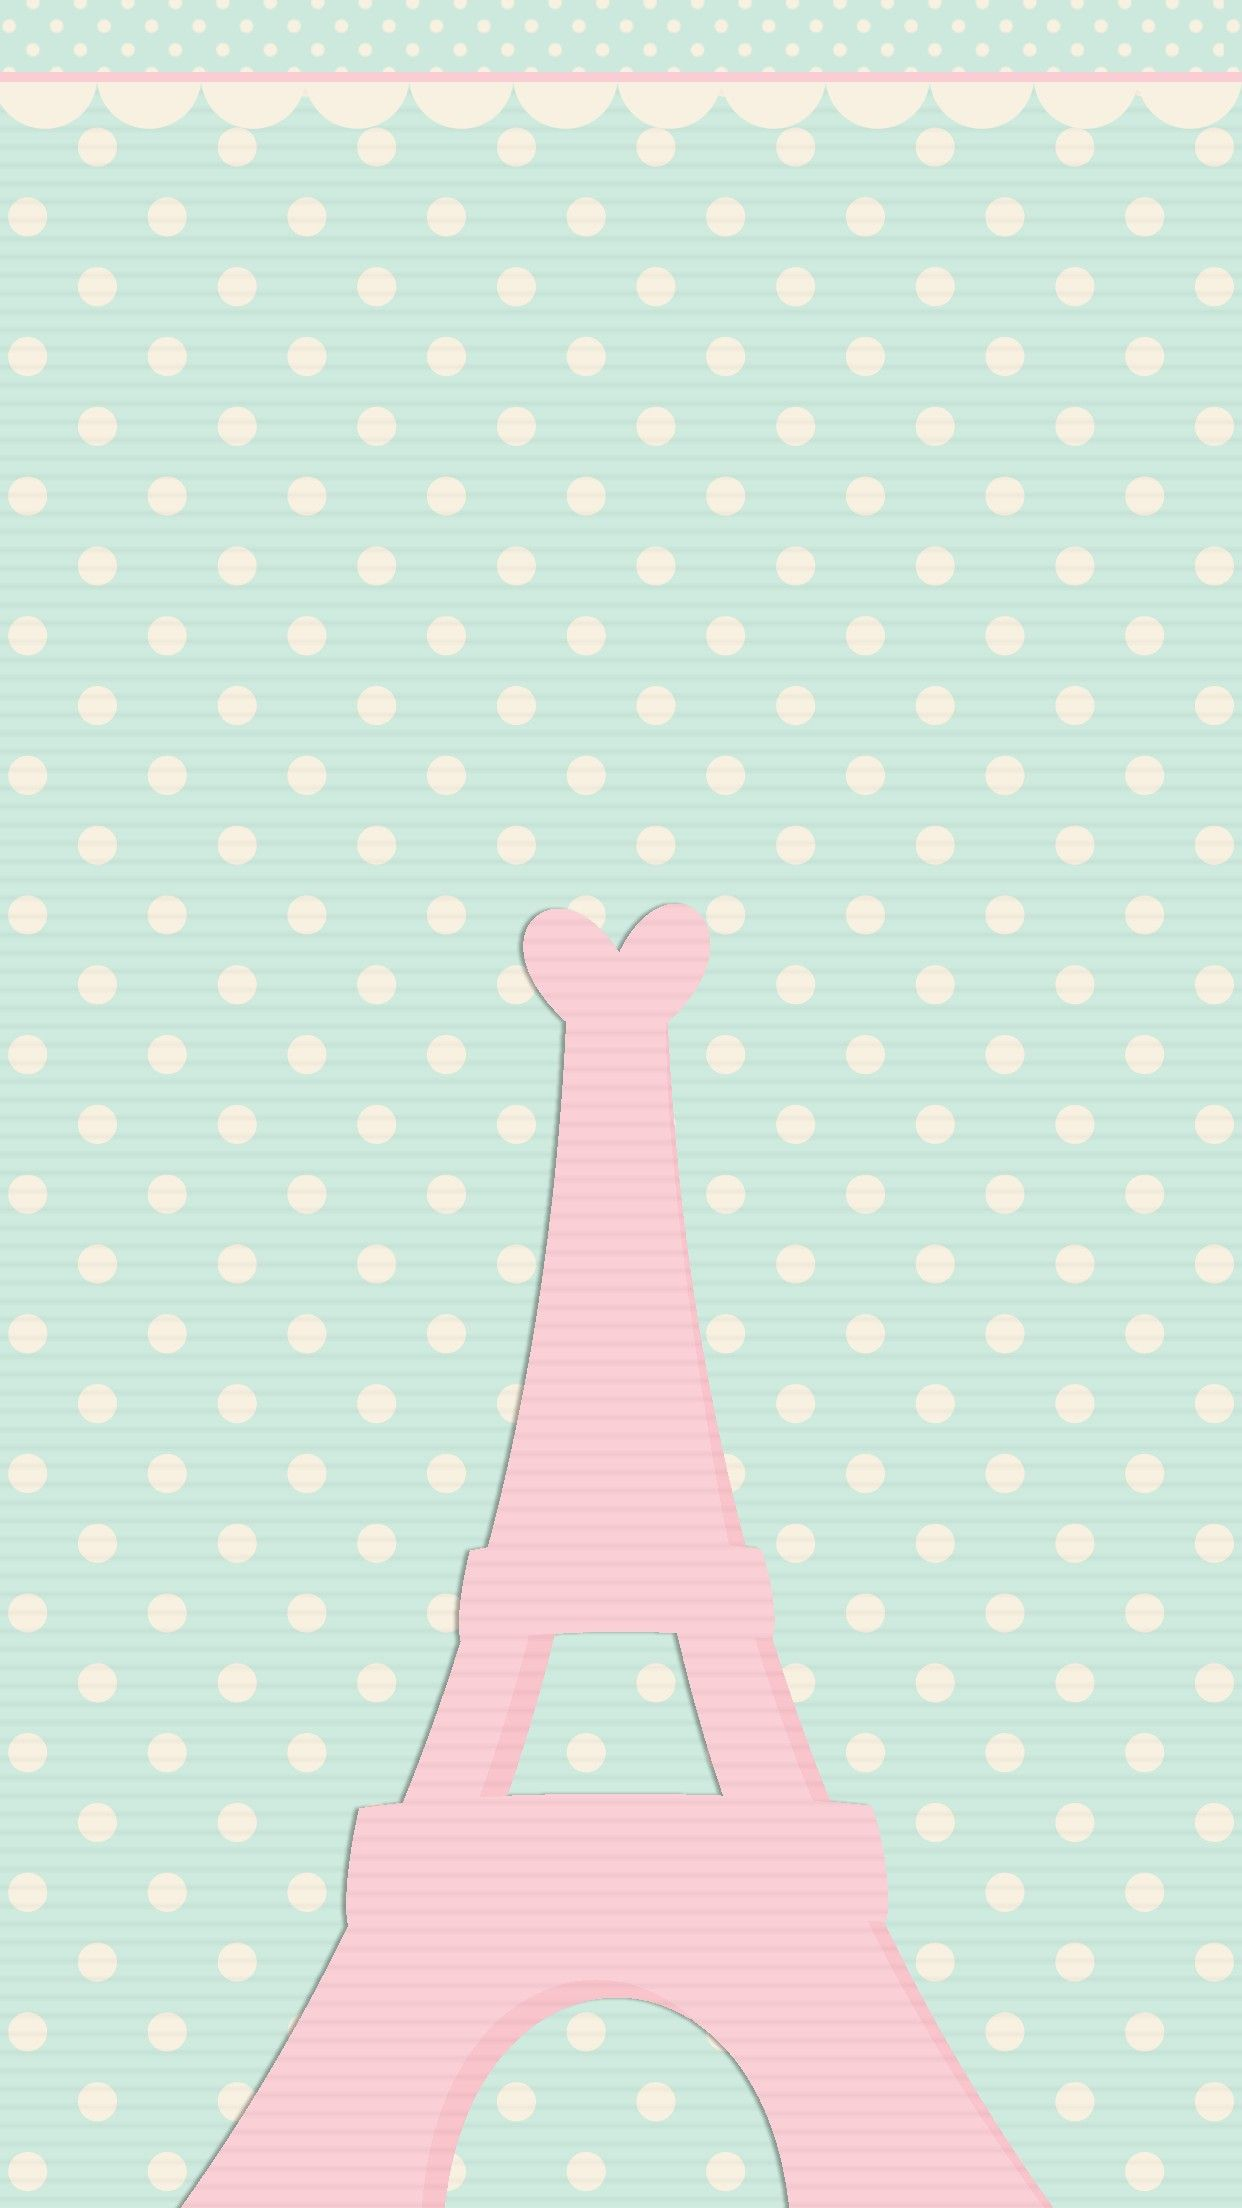 Beautiful Wallpaper Hello Kitty Peach - 03395f22199042552e5414938af721bd  Image_13834.jpg